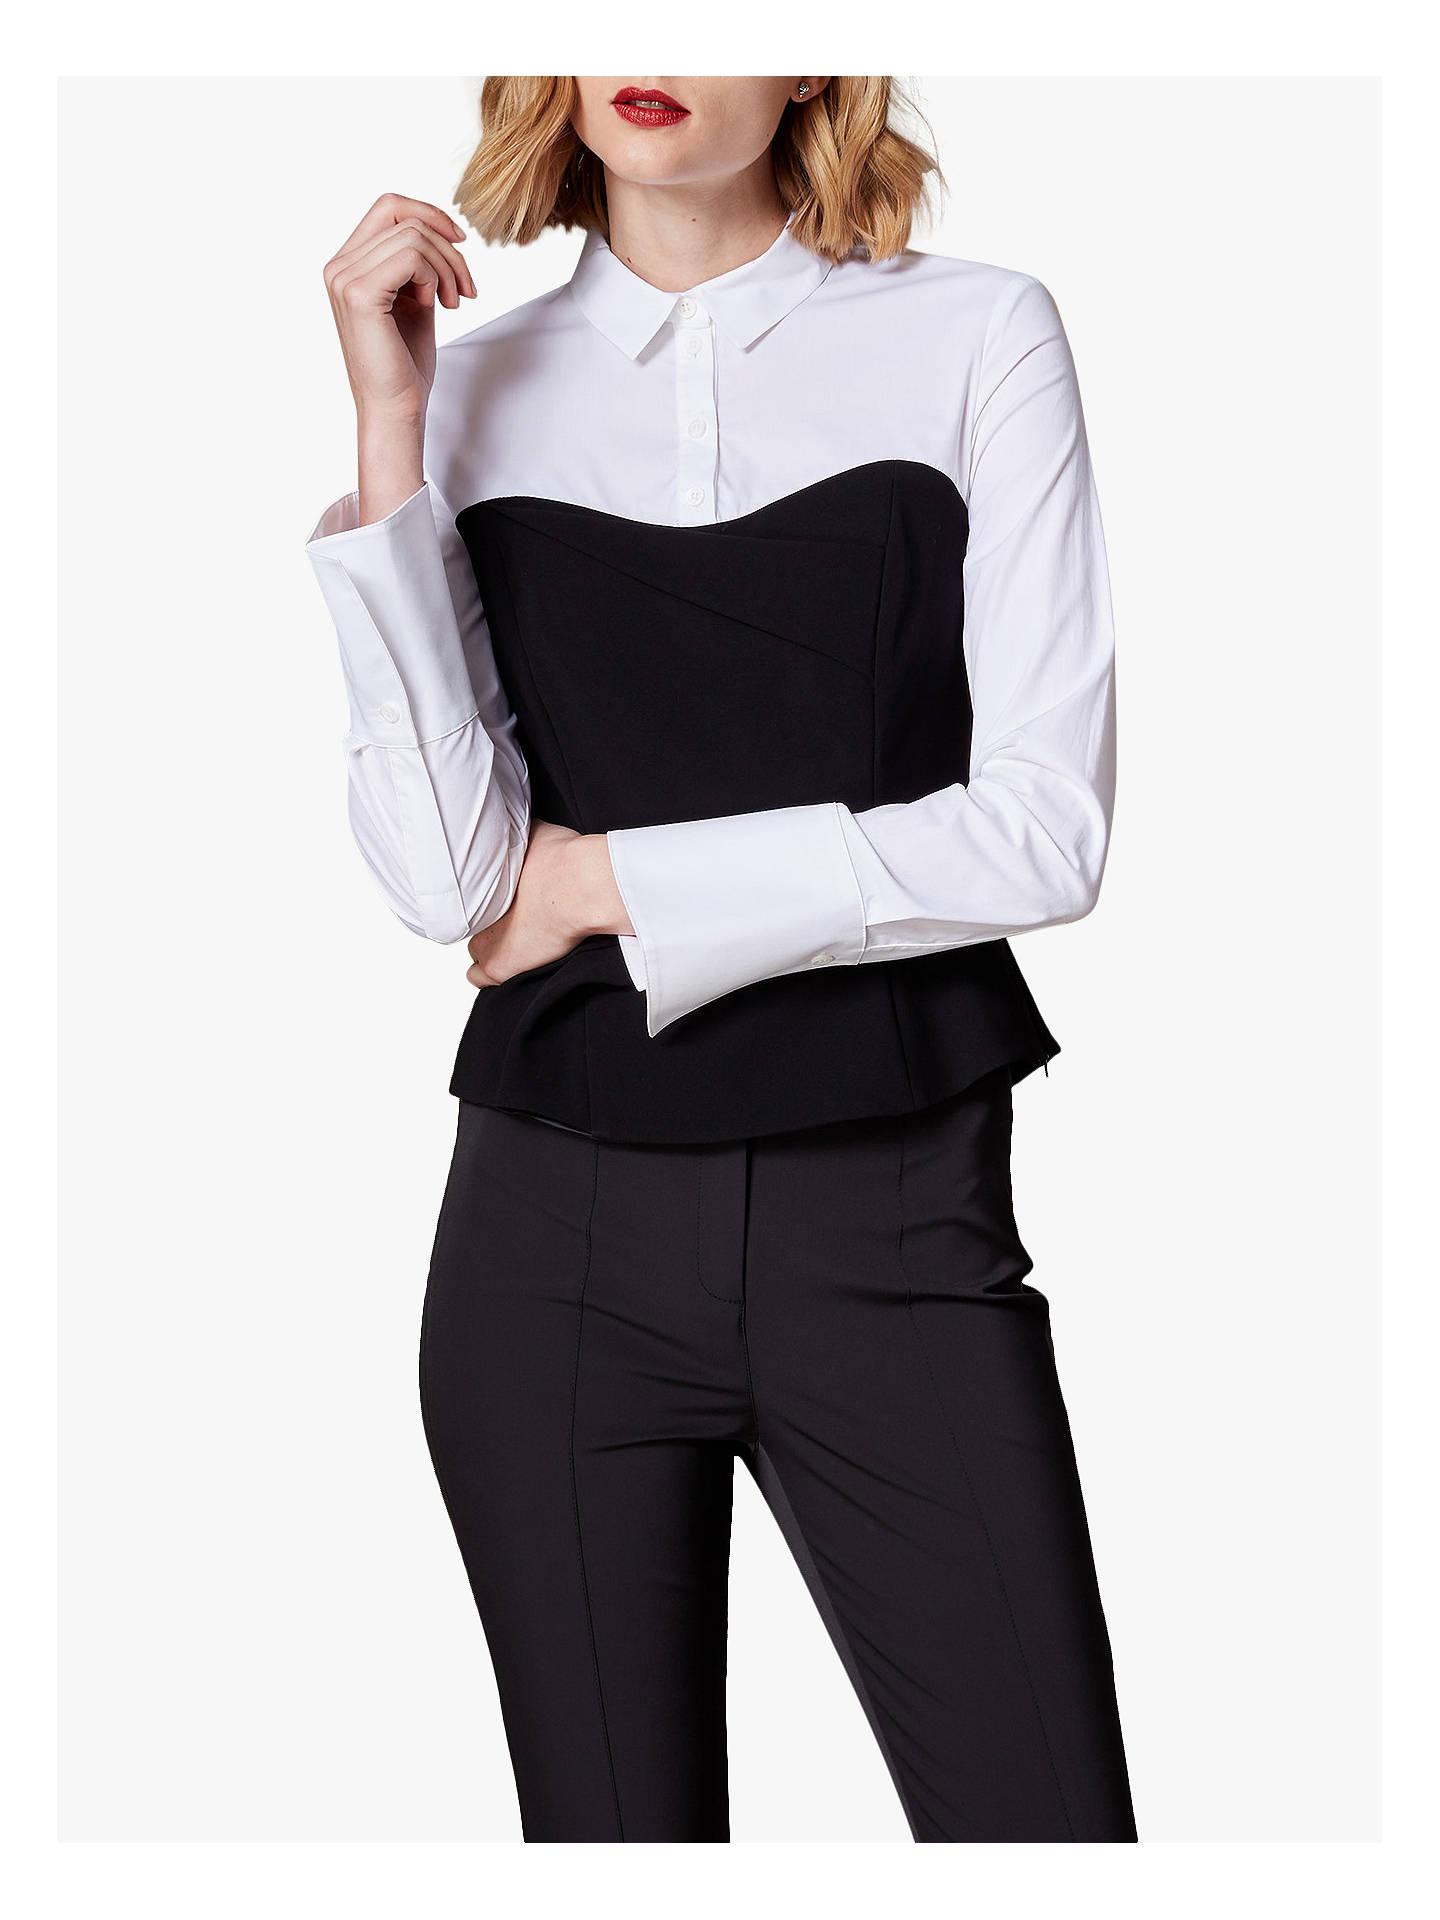 6dae2fd1a059 Buy Karen Millen Corset Shirt, Black/White, 10 Online at johnlewis.com ...